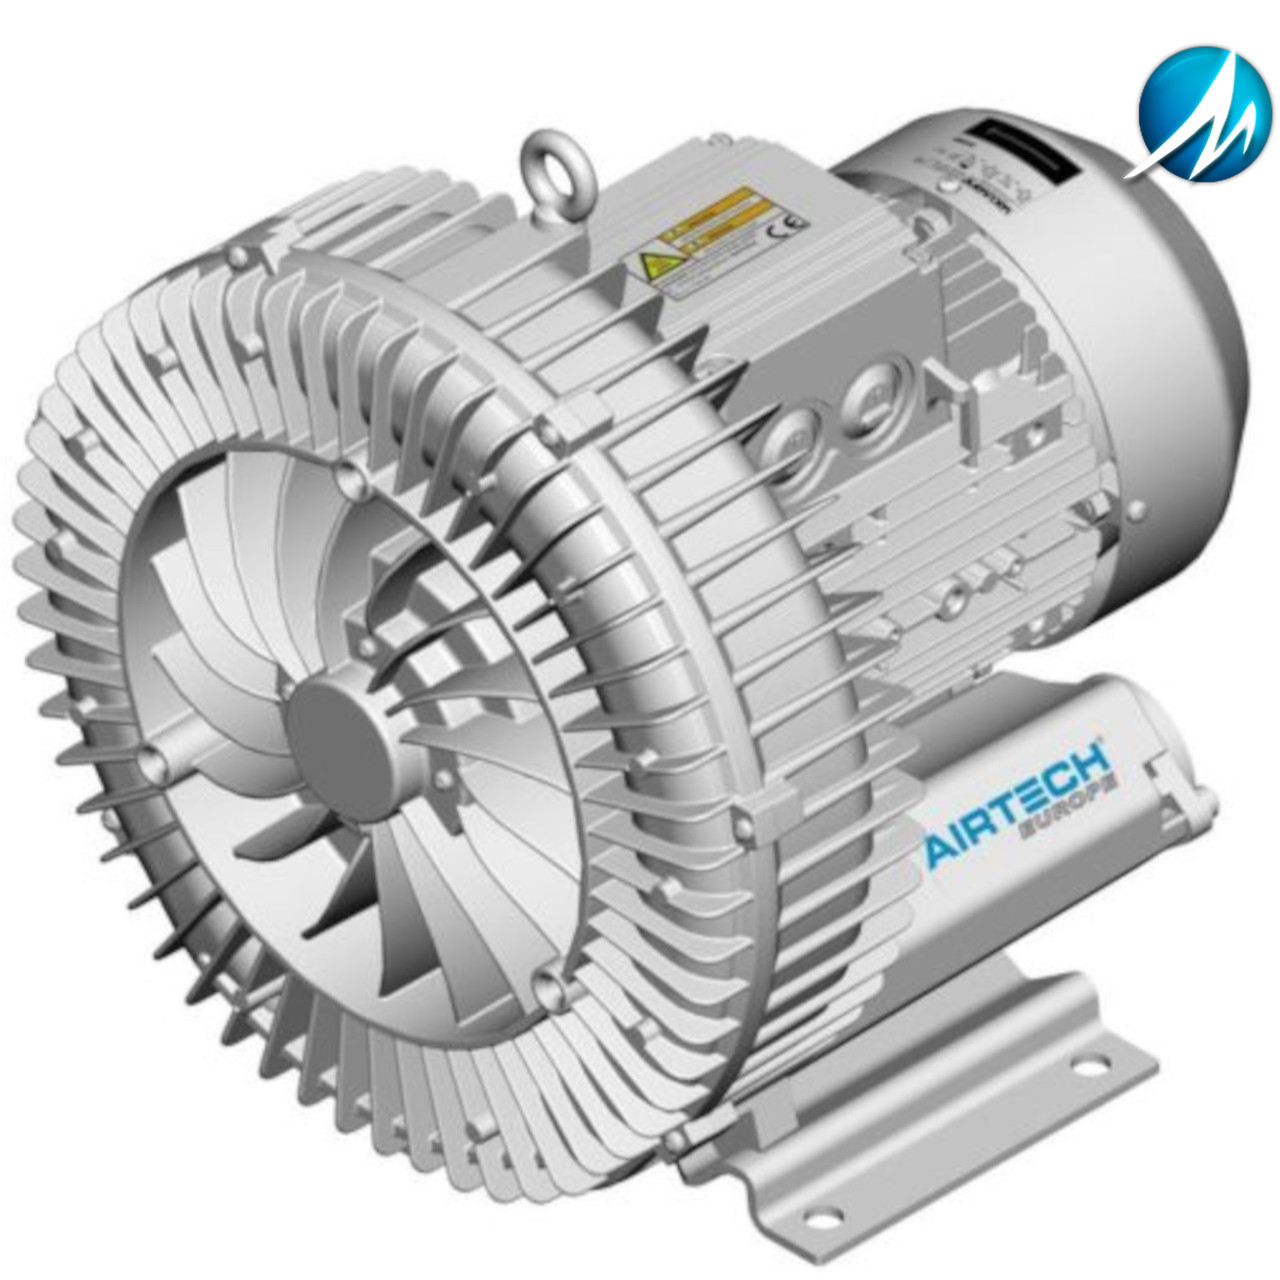 Компрессор HPE AIRTECH 1,3 кВт (210 м³/ч, 170 мБар, 380 В)